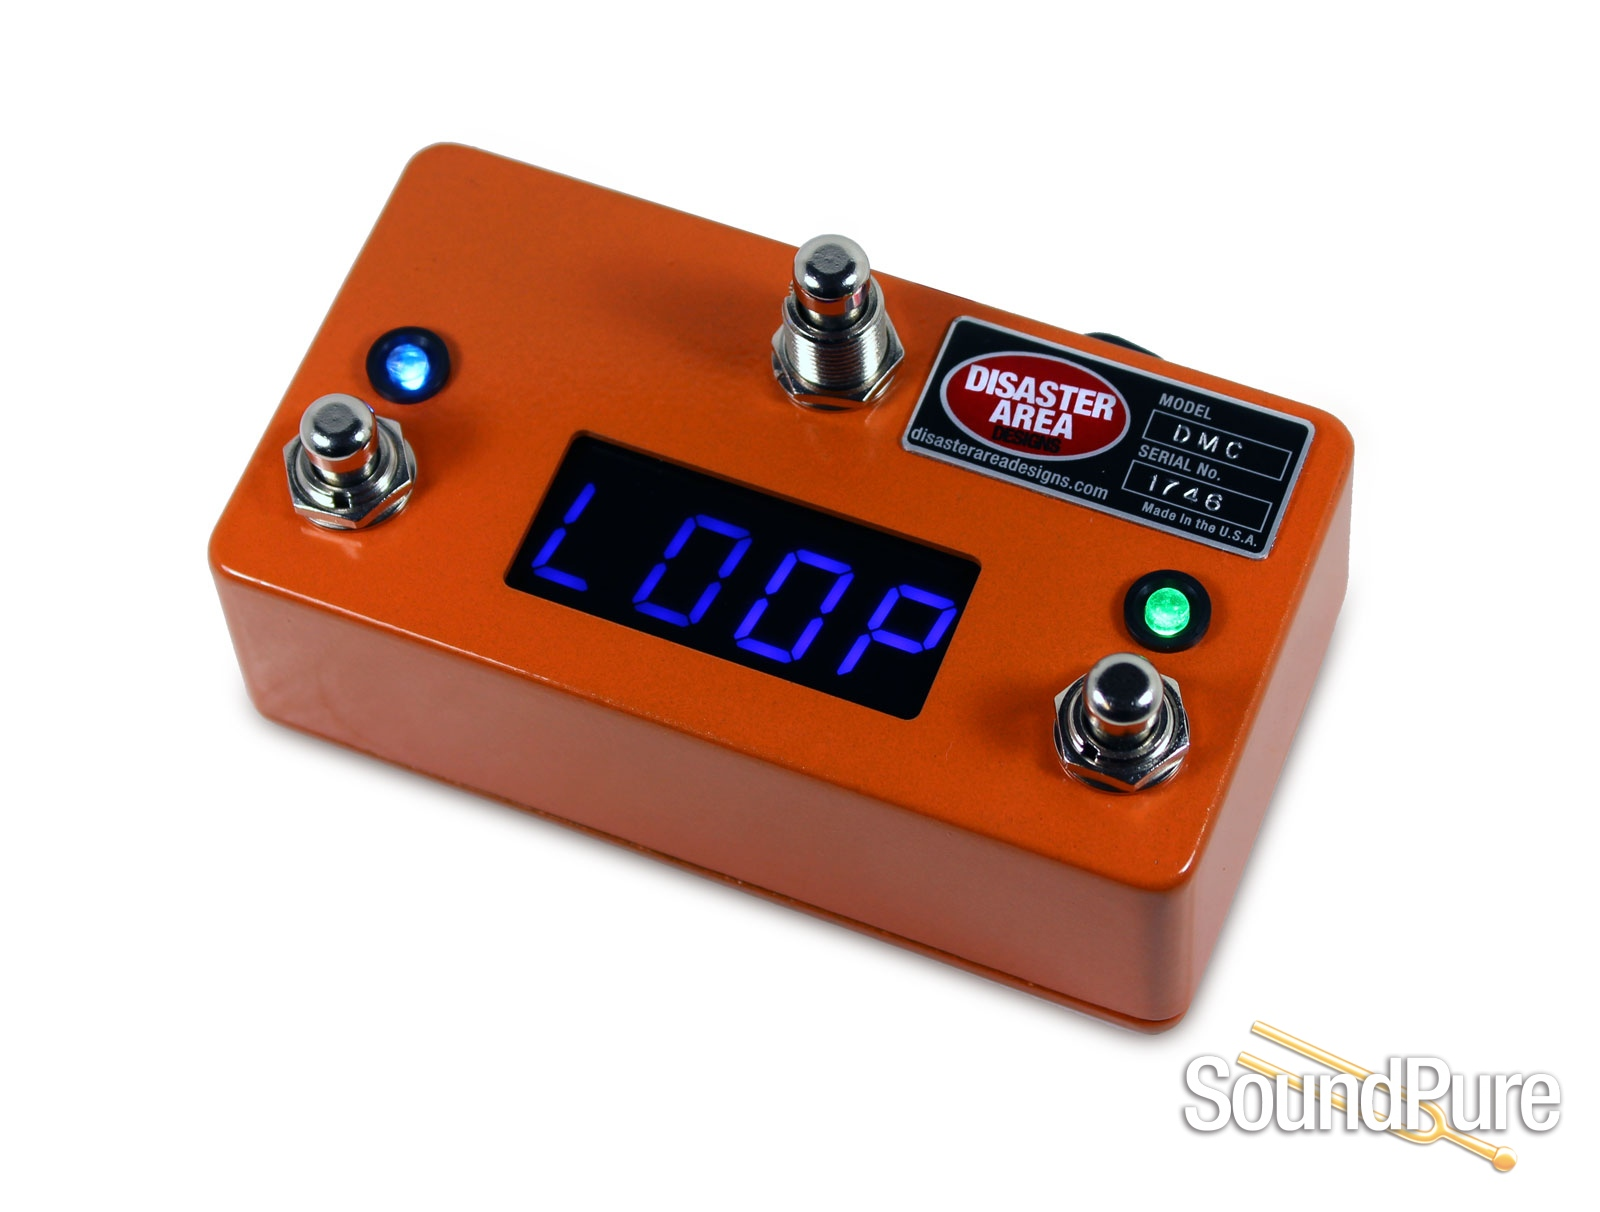 Disaster Area Designs DMC-3XL MIDI Controller- Camino Orange